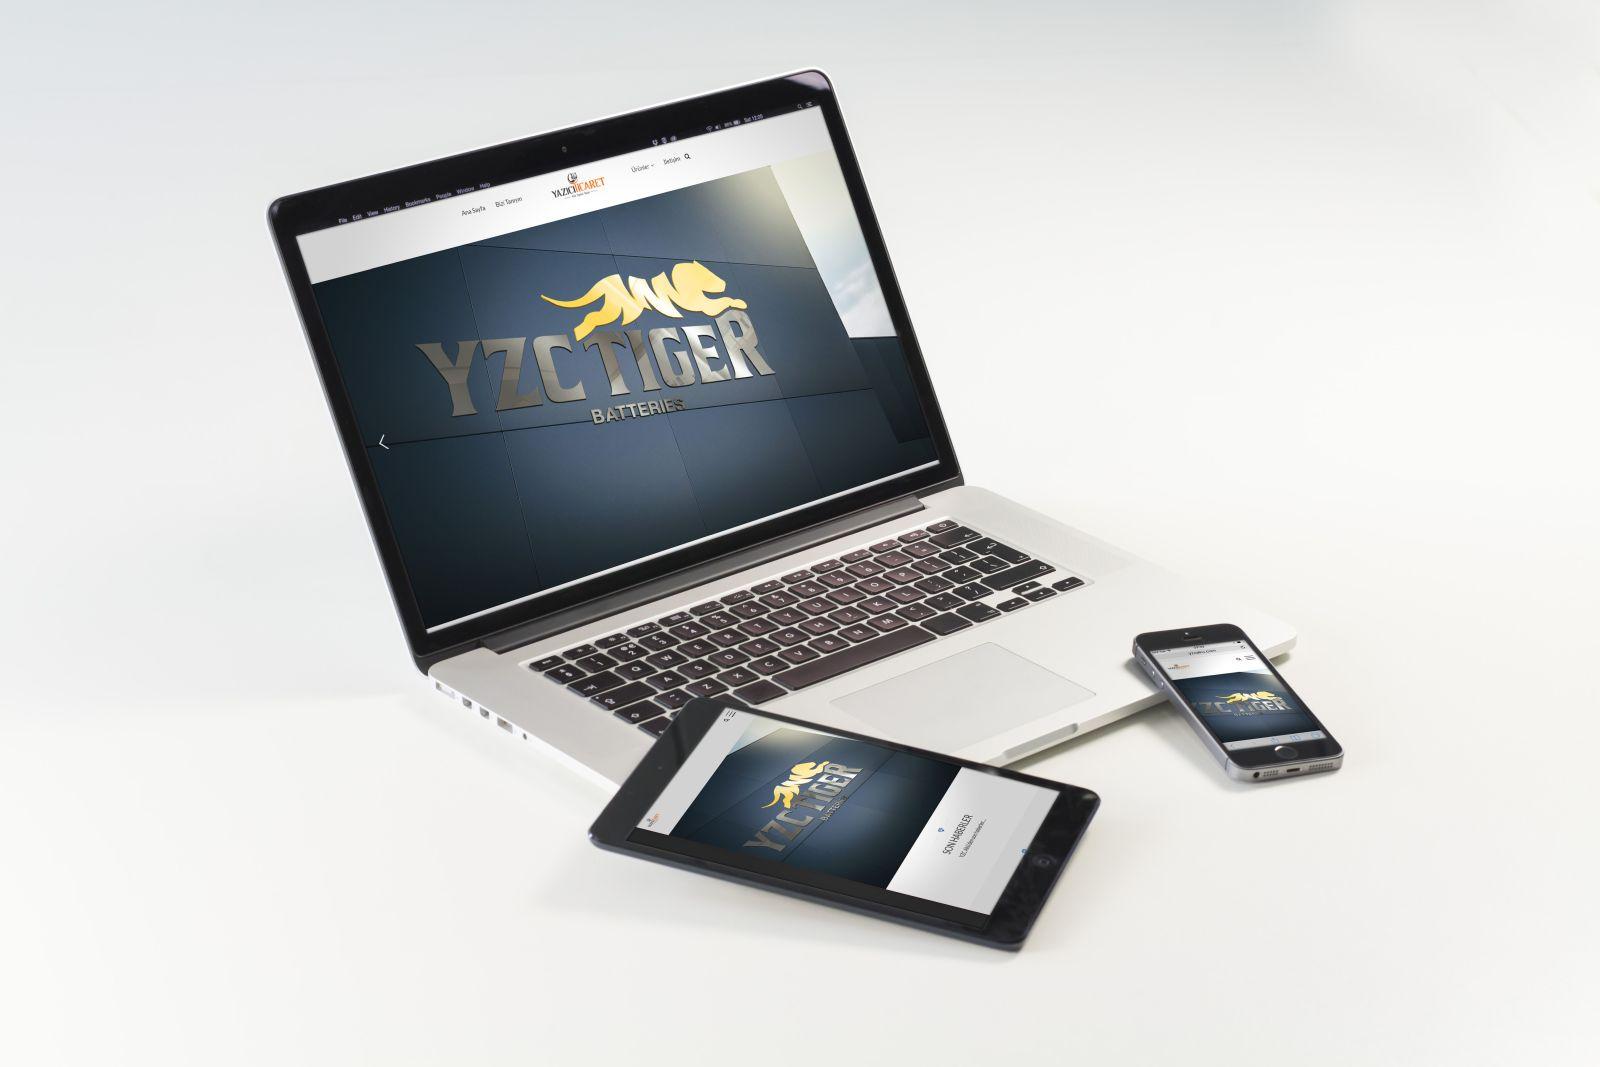 YZC Tiger Akü Web Sitesi Yayında